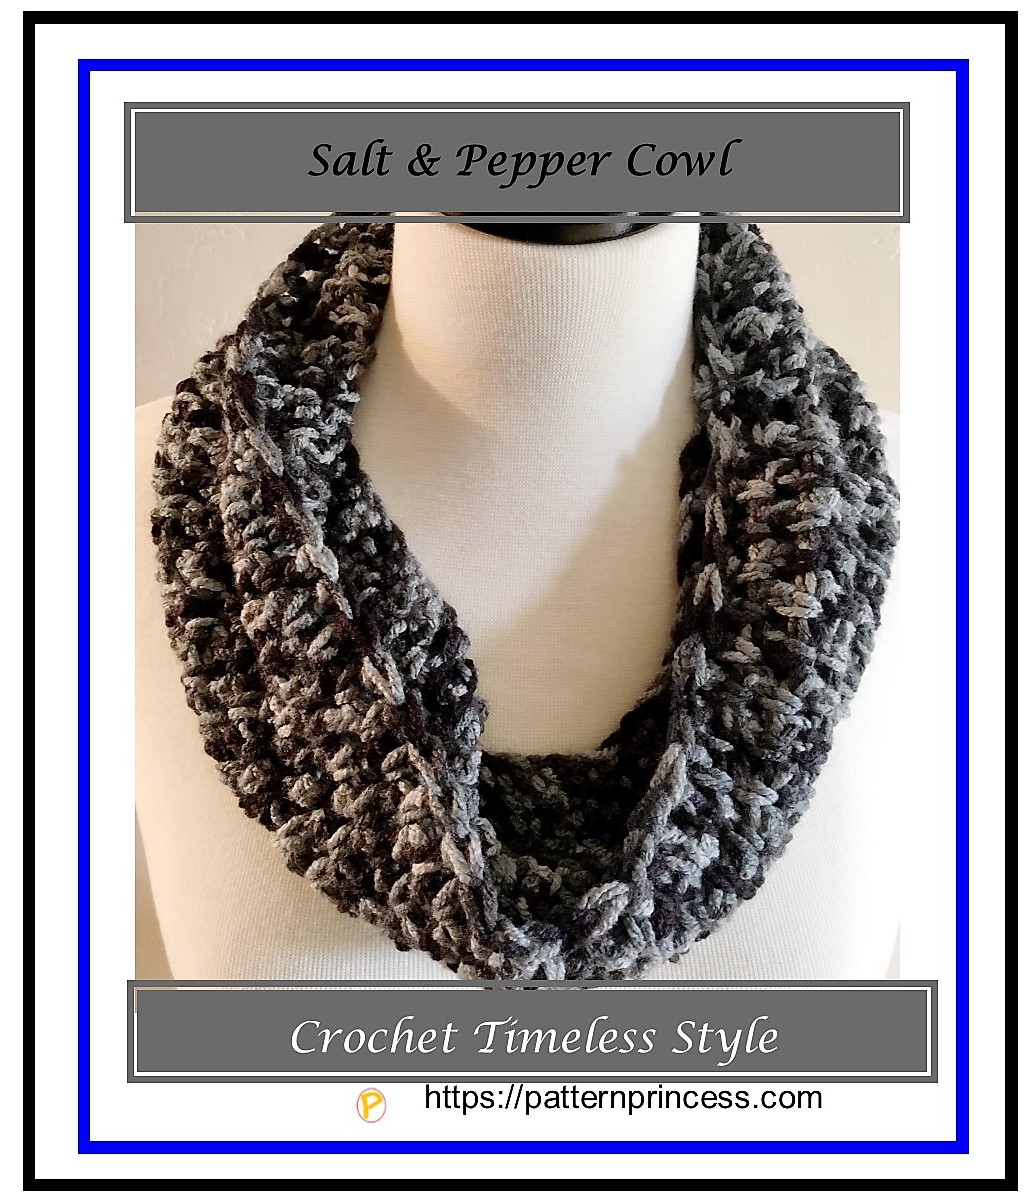 Salt and Pepper Cowl 1